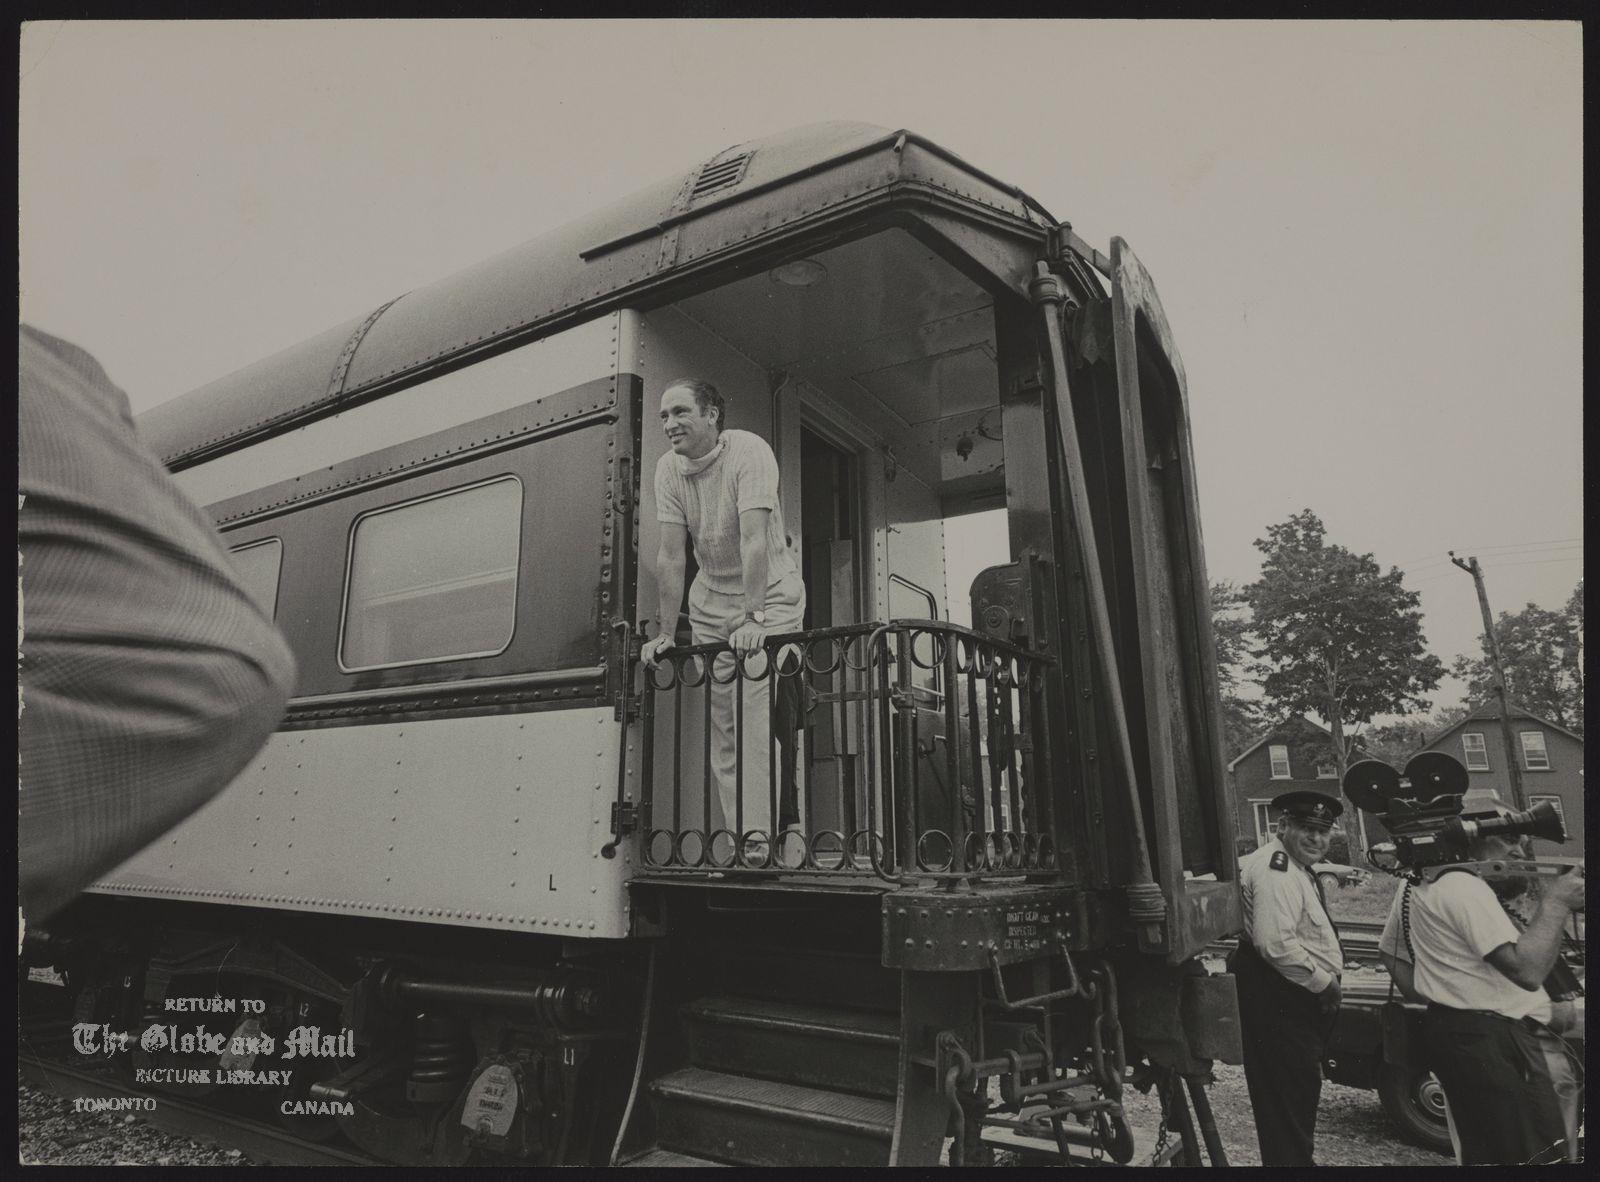 Pierre Elliott TRUDEAU Qubec. Politician. Prime Minister Trudeau stands on rear platform of his train at railway siding ain Stratford.